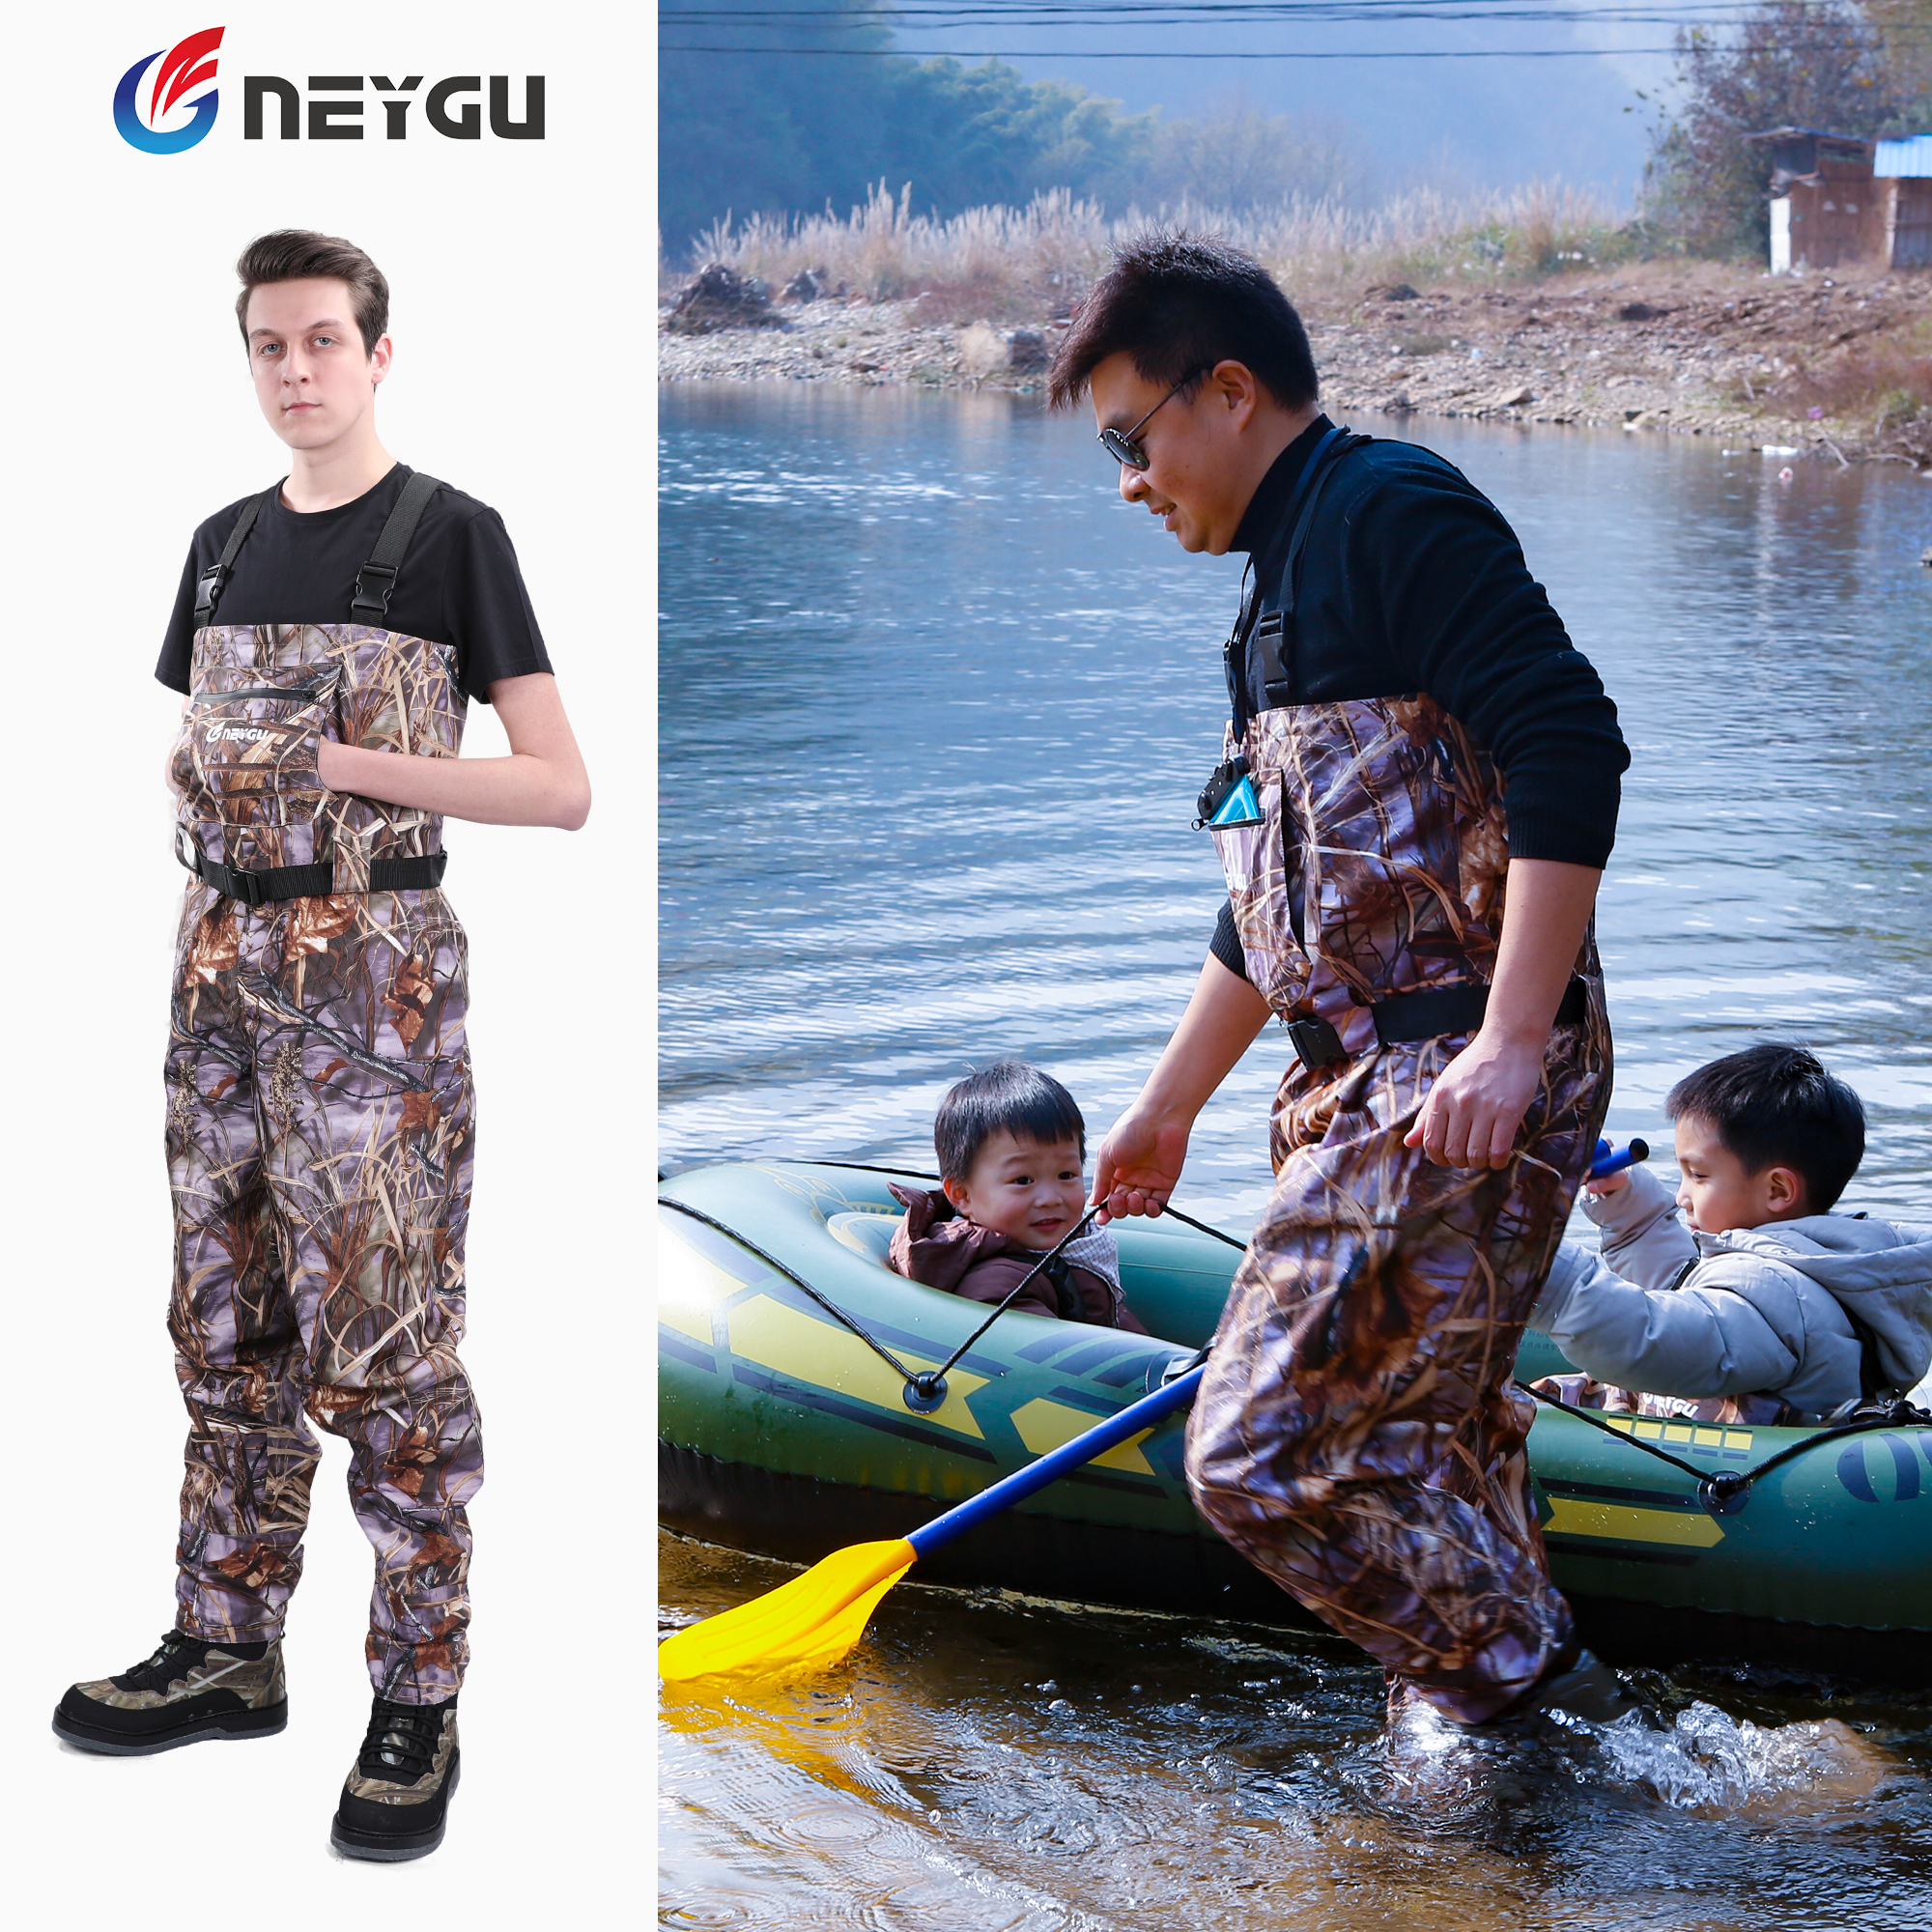 Neygu Quick drain Breathable Waders Stockingfoot Chest Wader Fishing Hunting Pants Marsh Hiking pants